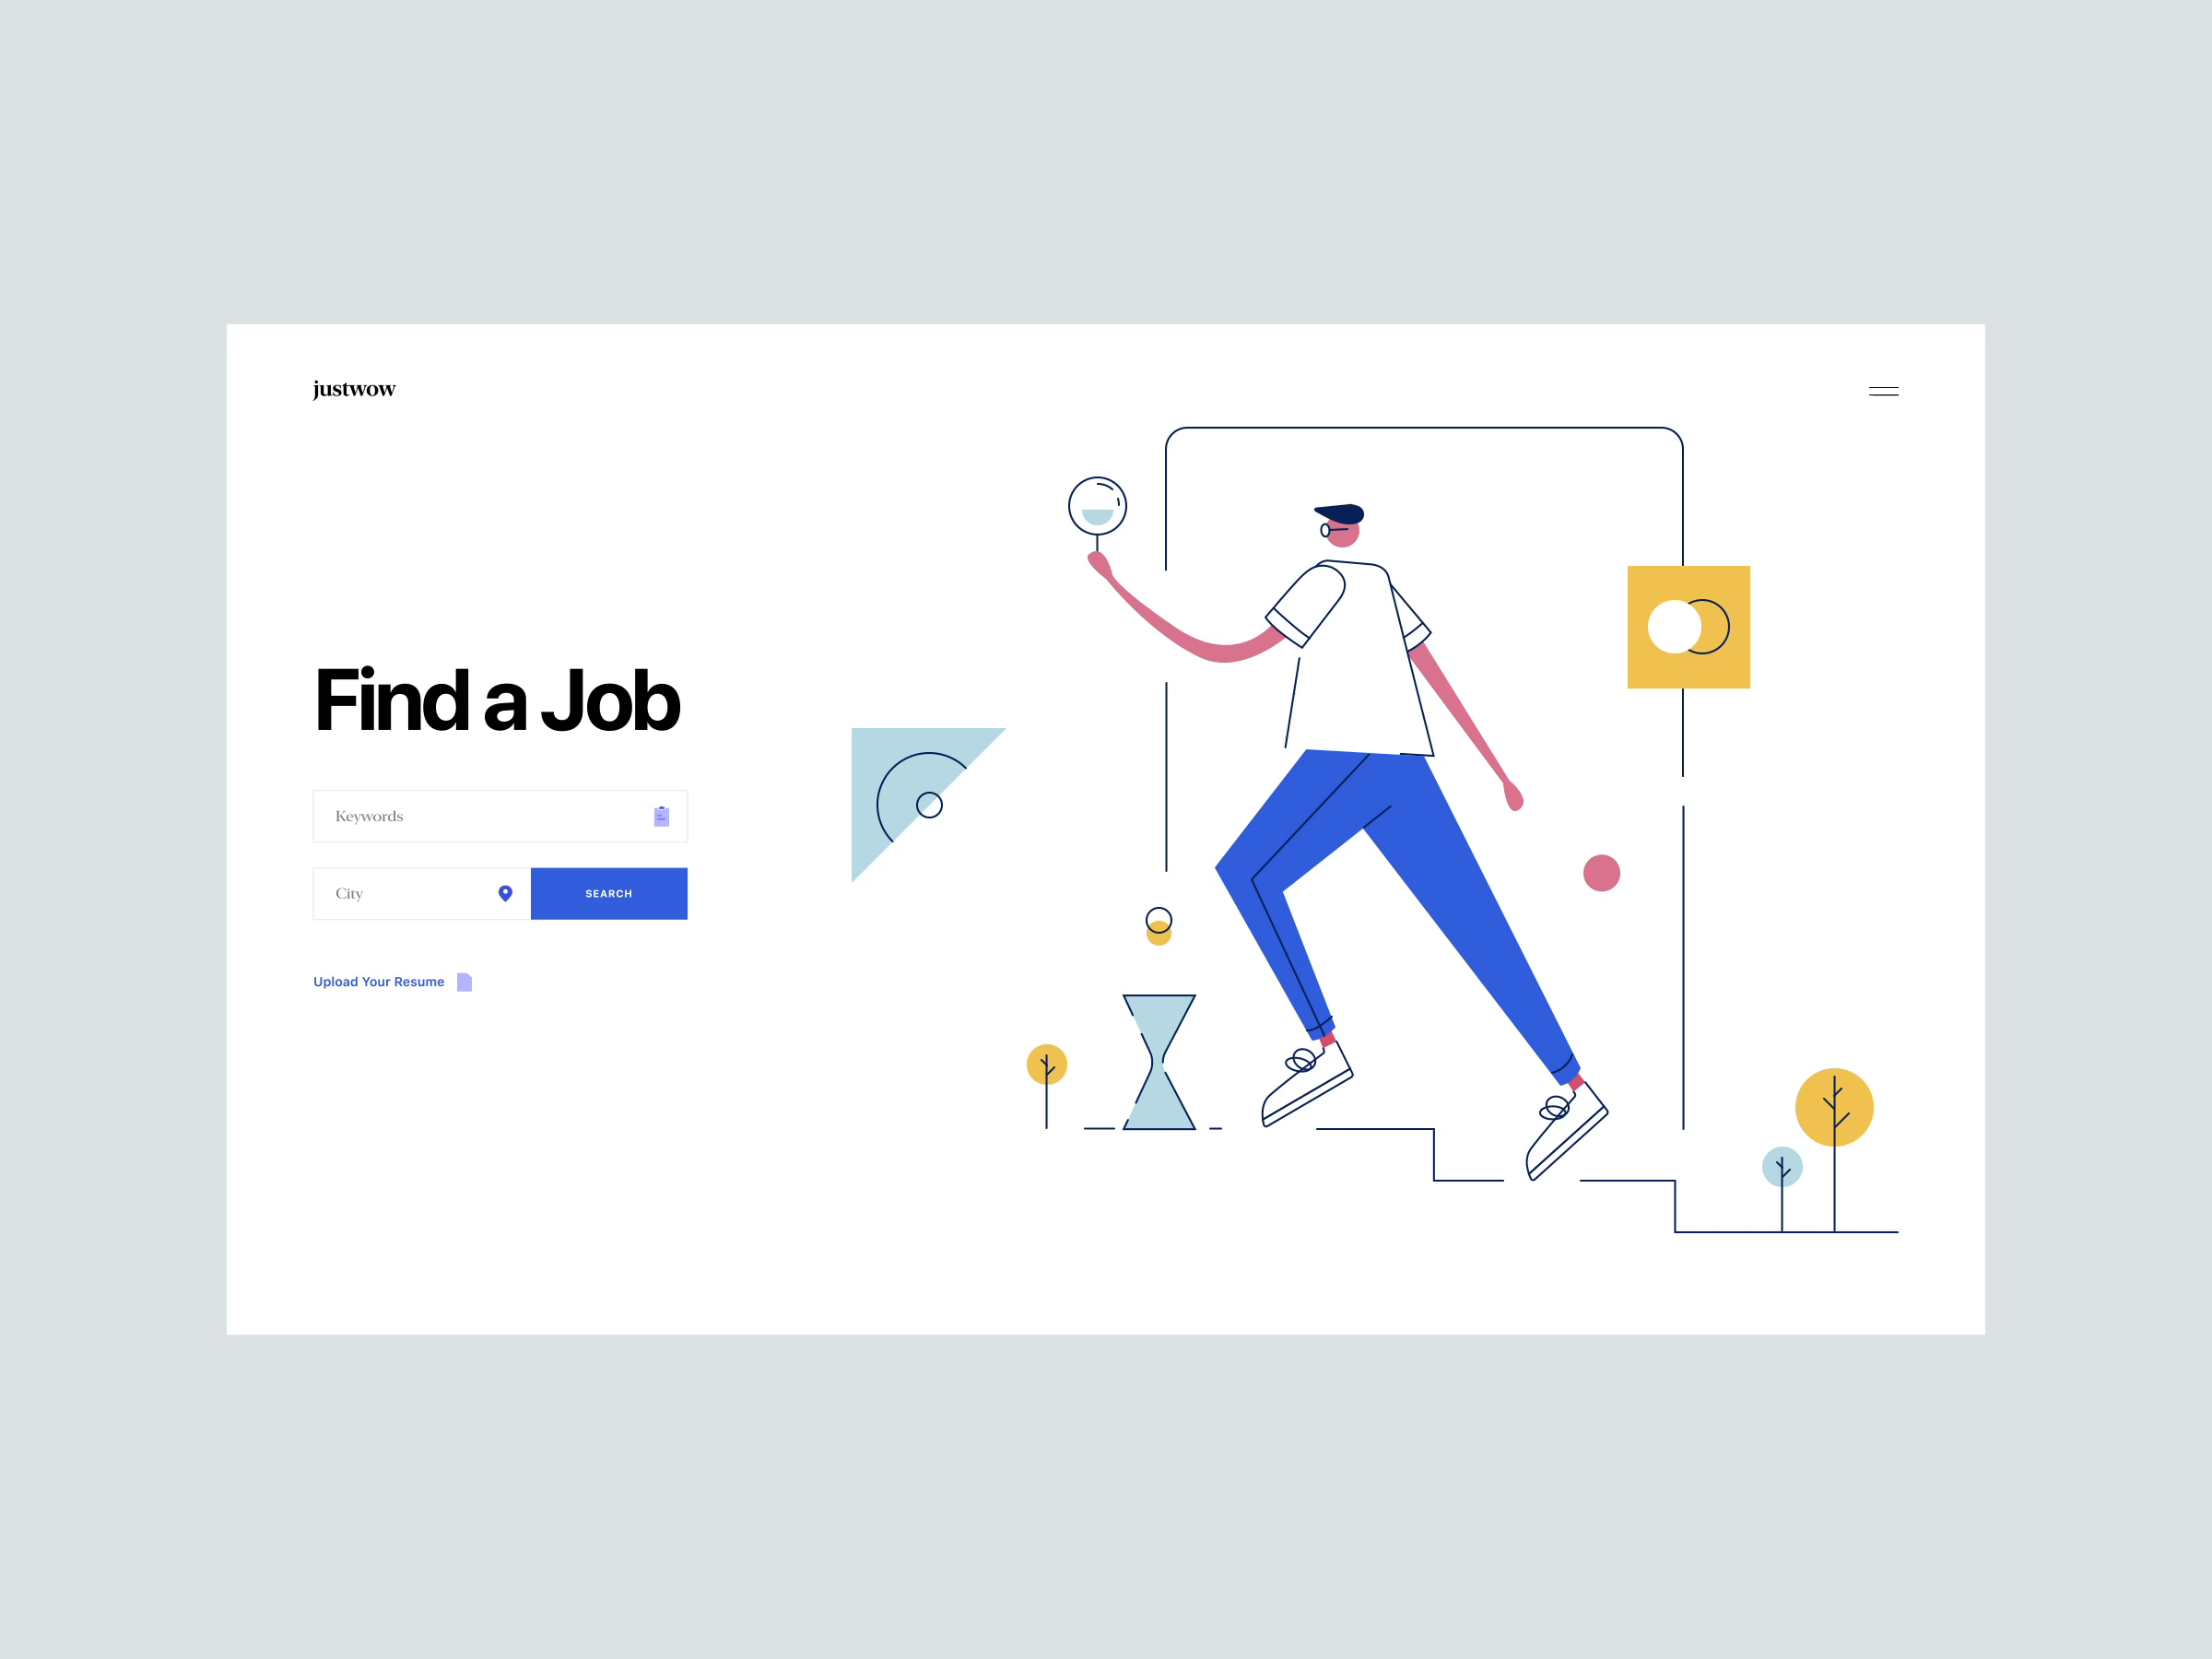 Find a job 1